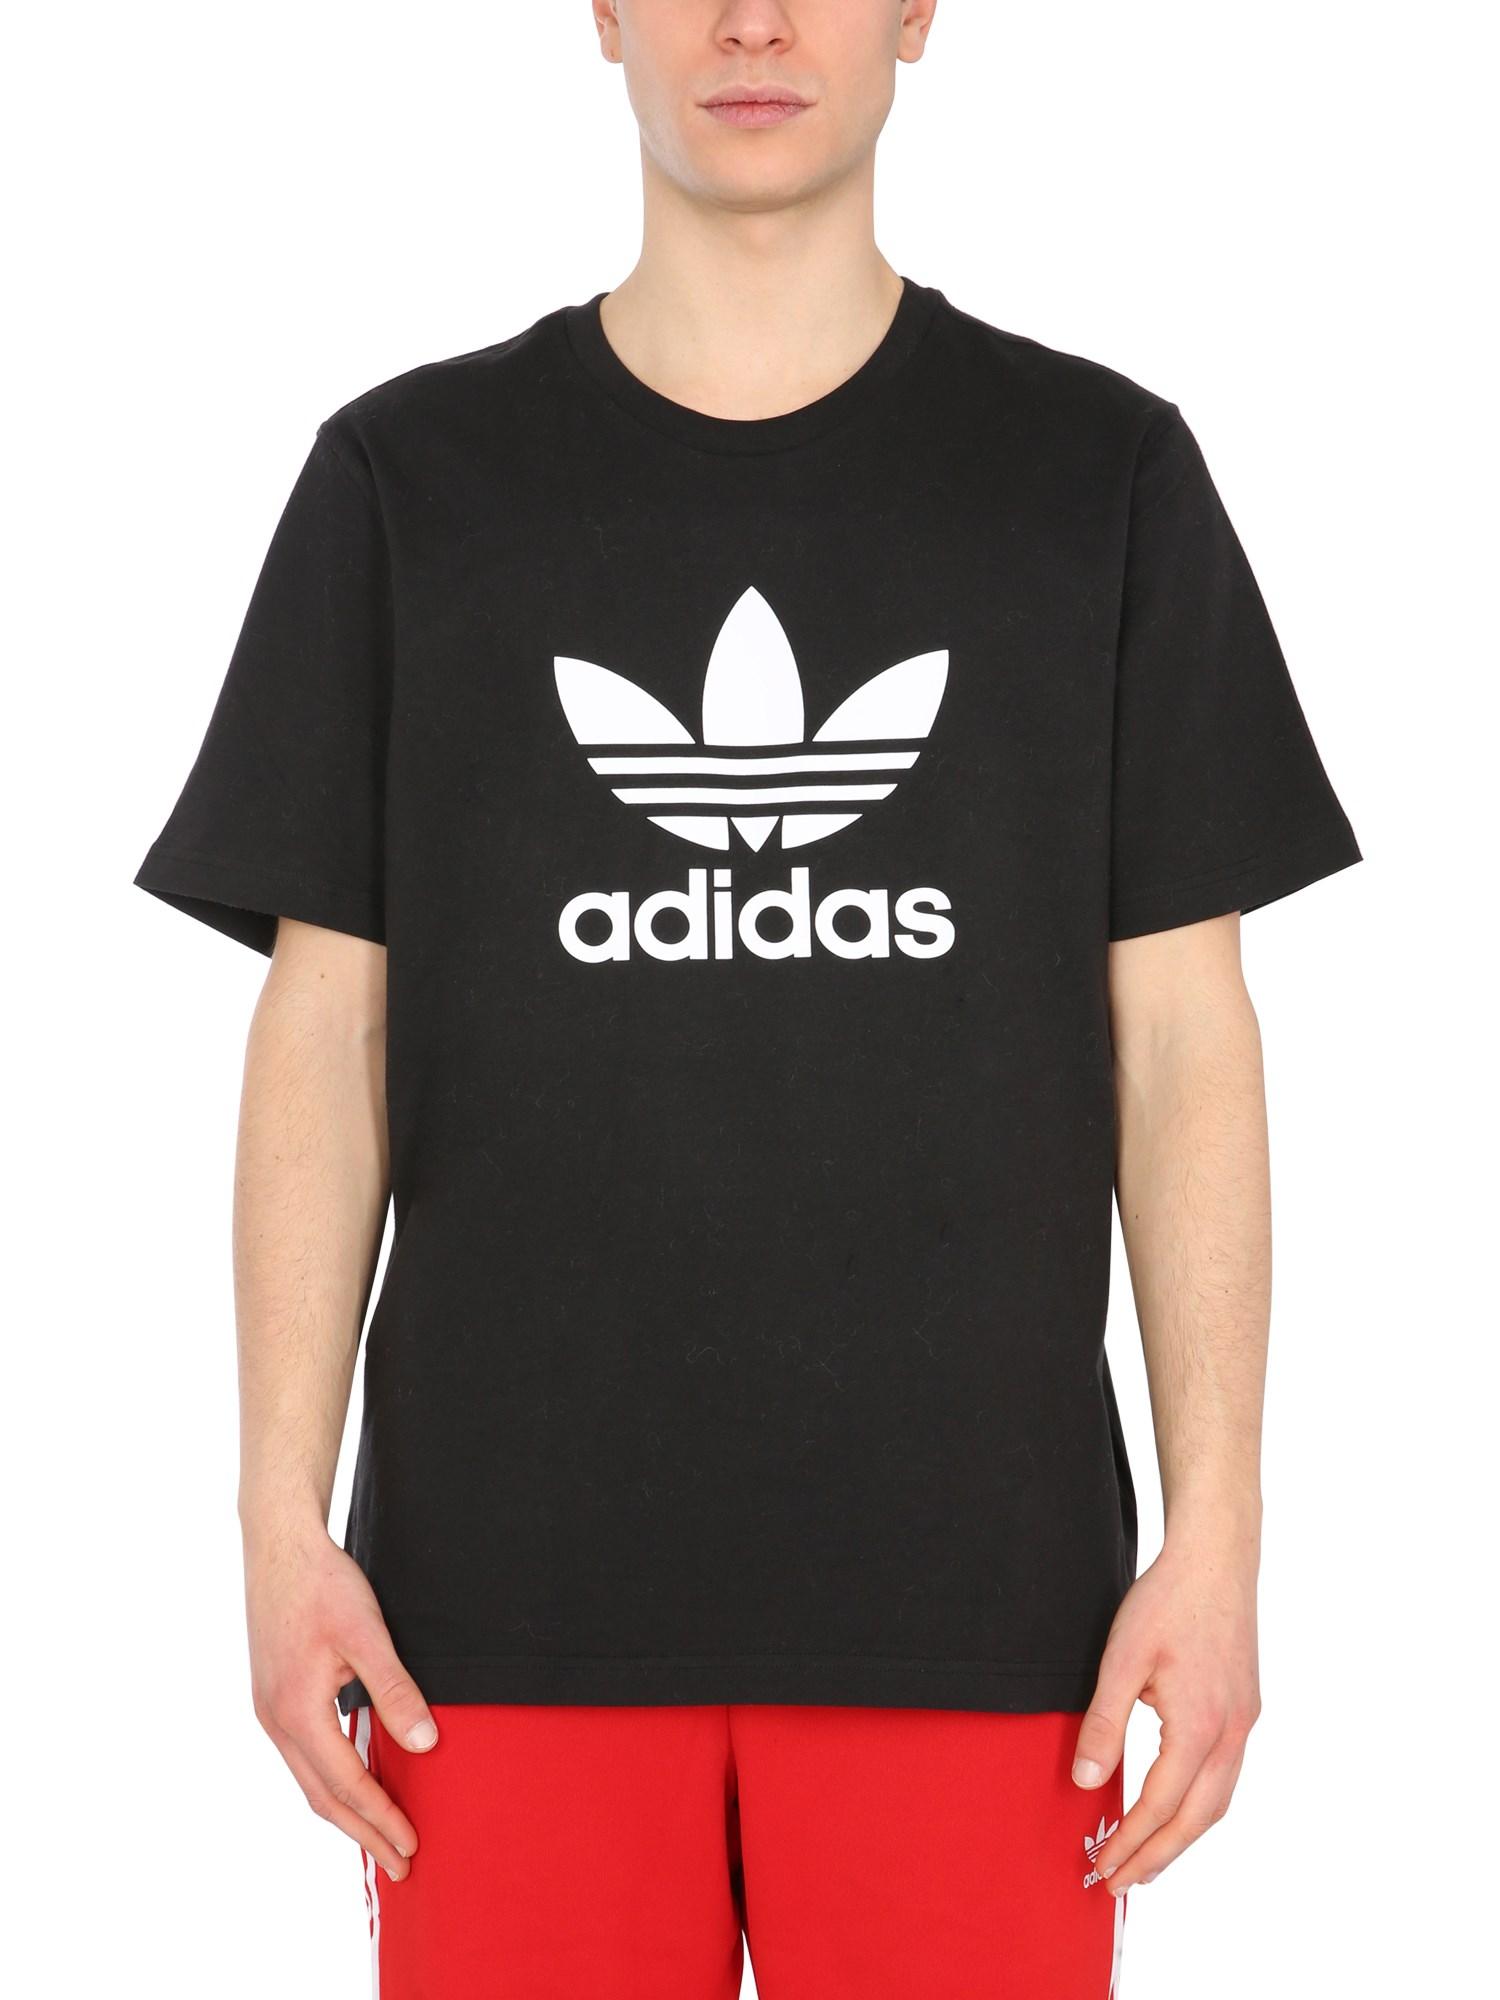 adidas originals crew neck t-shirt